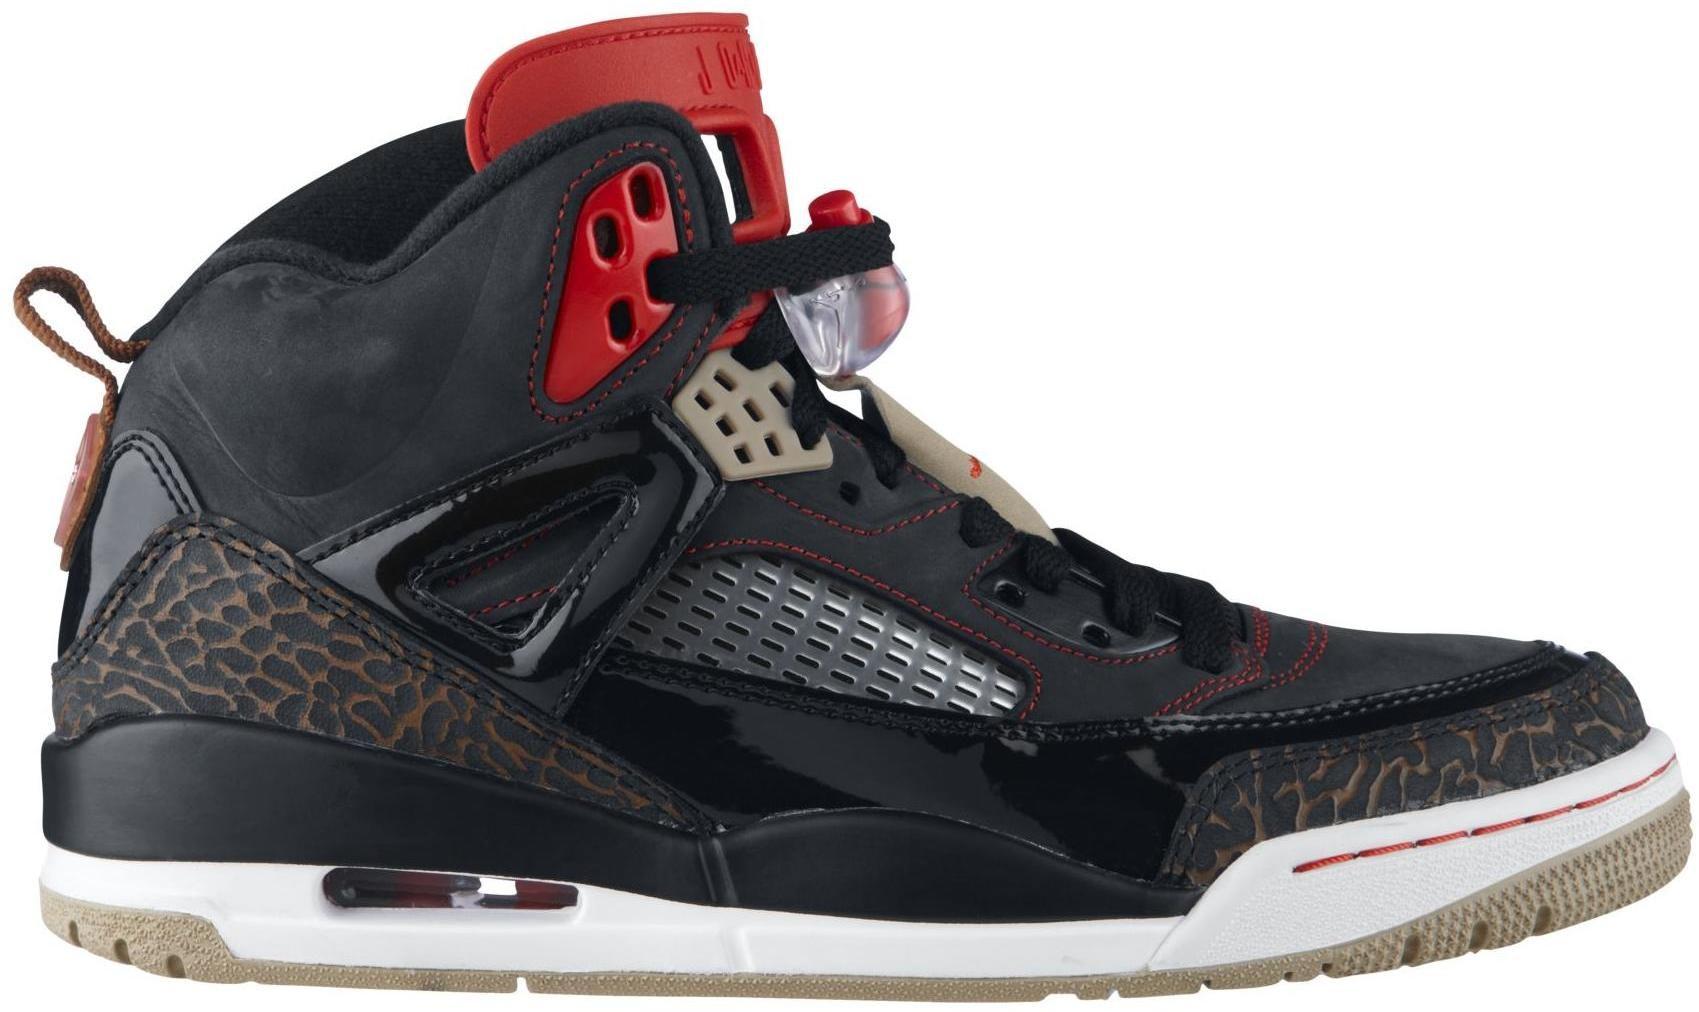 e09d9c1ad27d Jordan Spizike For Cheap